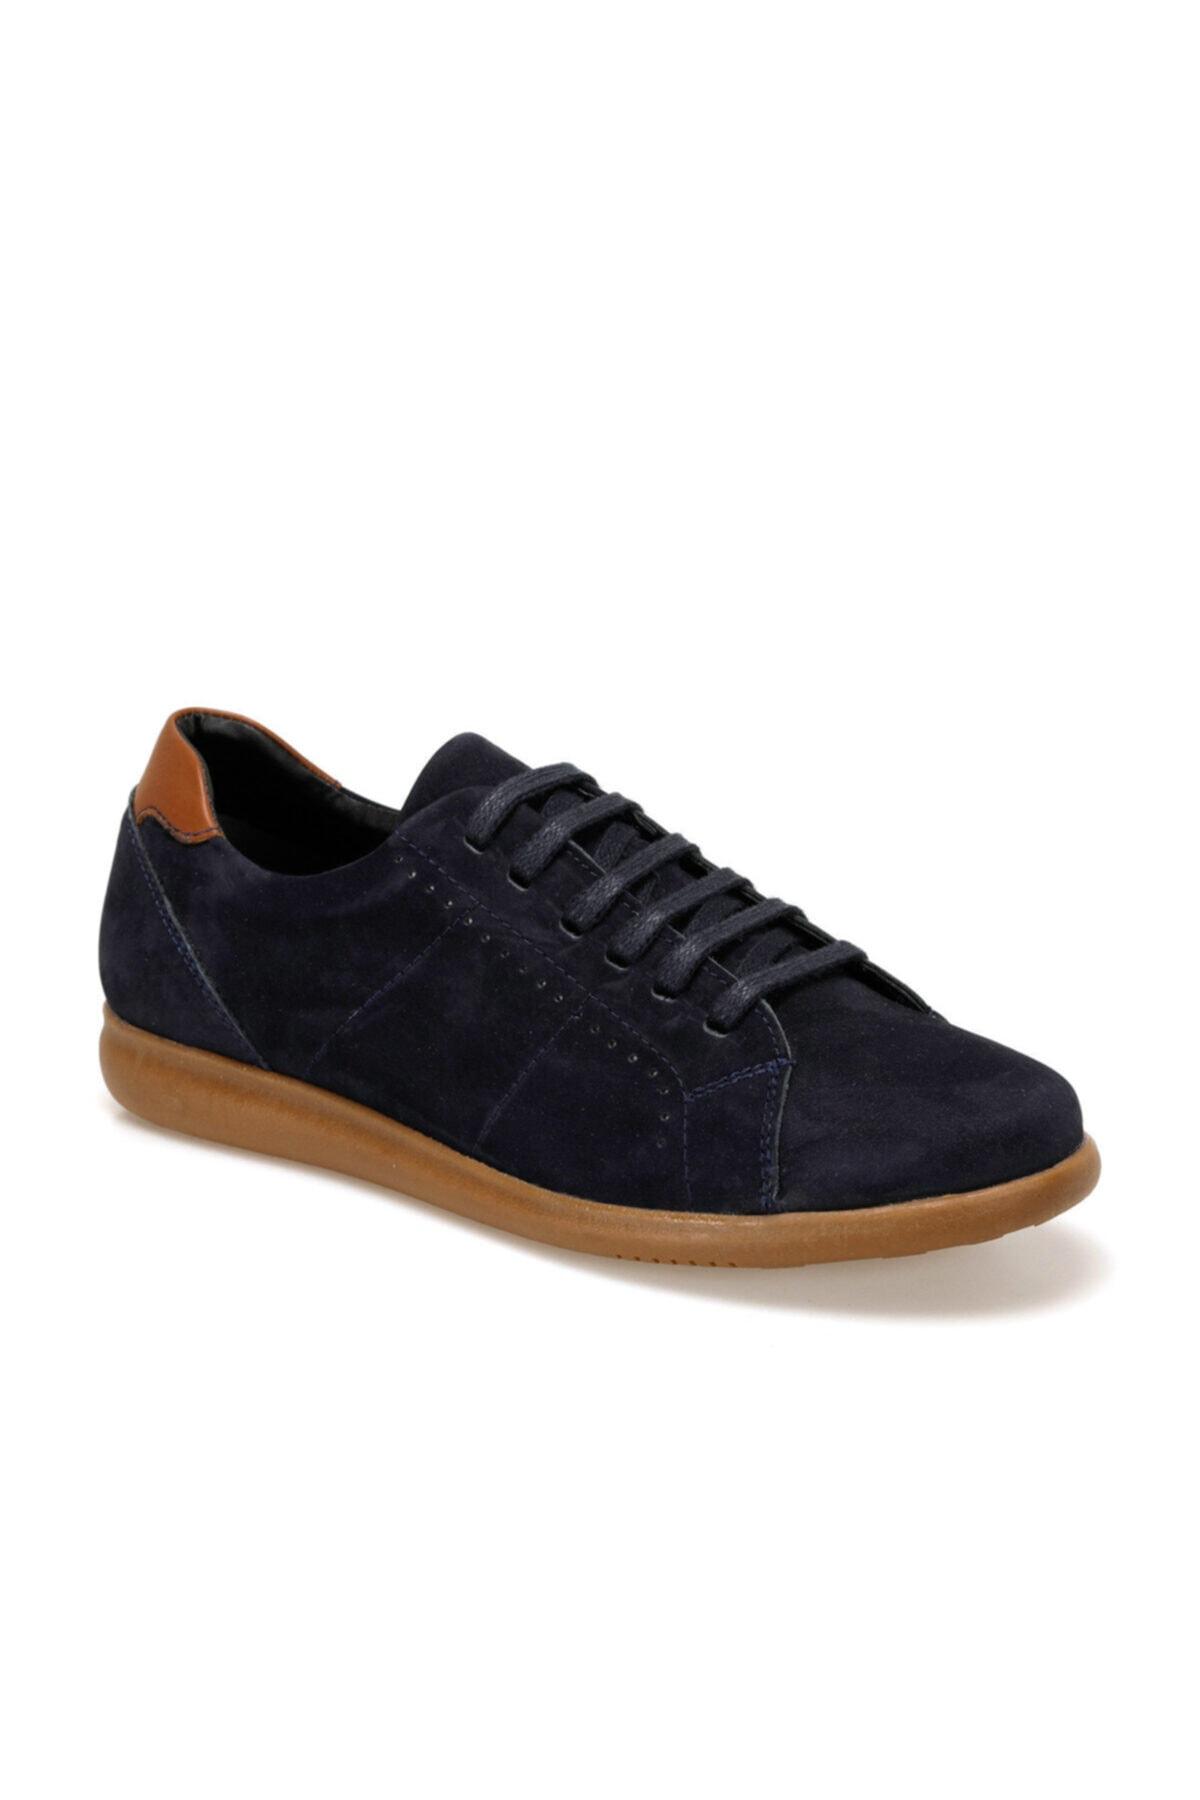 OXIDE Bs2-n Lacivert Erkek Casual Ayakkabı 1